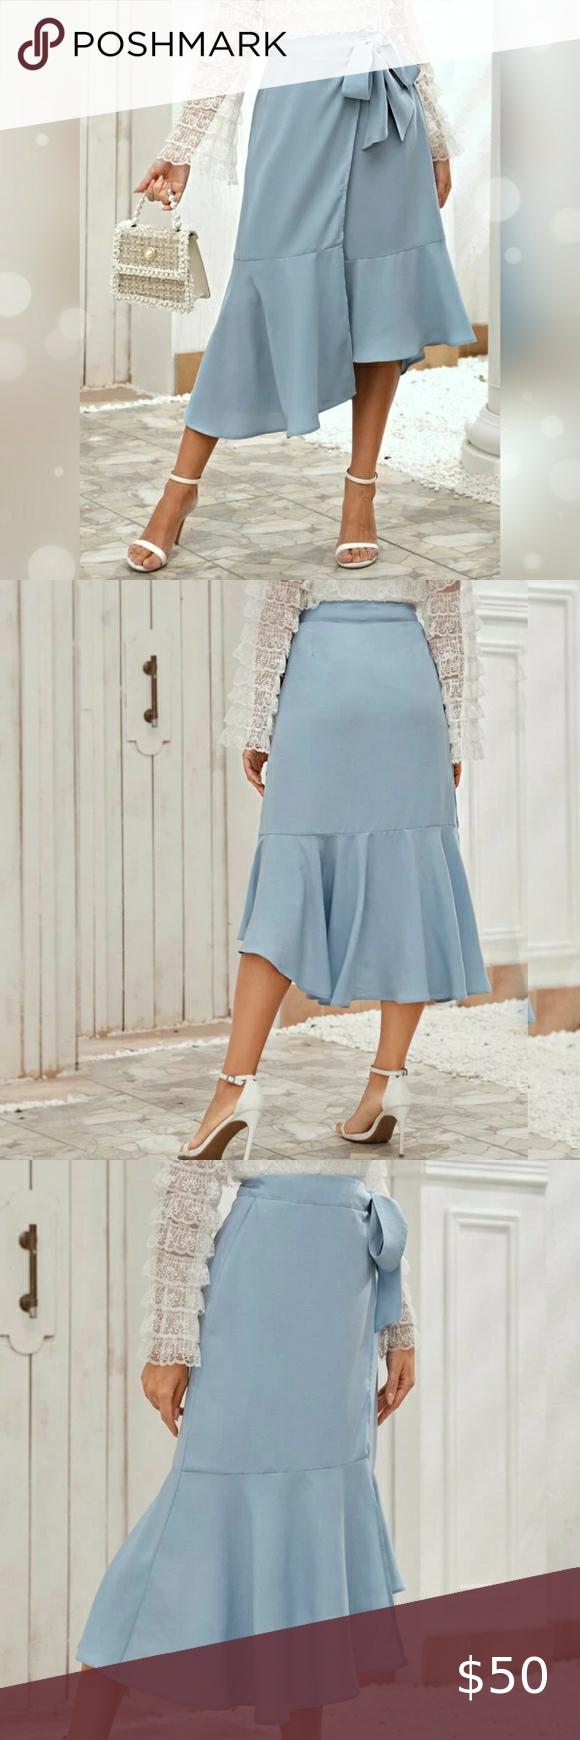 Tie Front Asymmetrical Ruffle Hem Wrap Skirt XL Ti